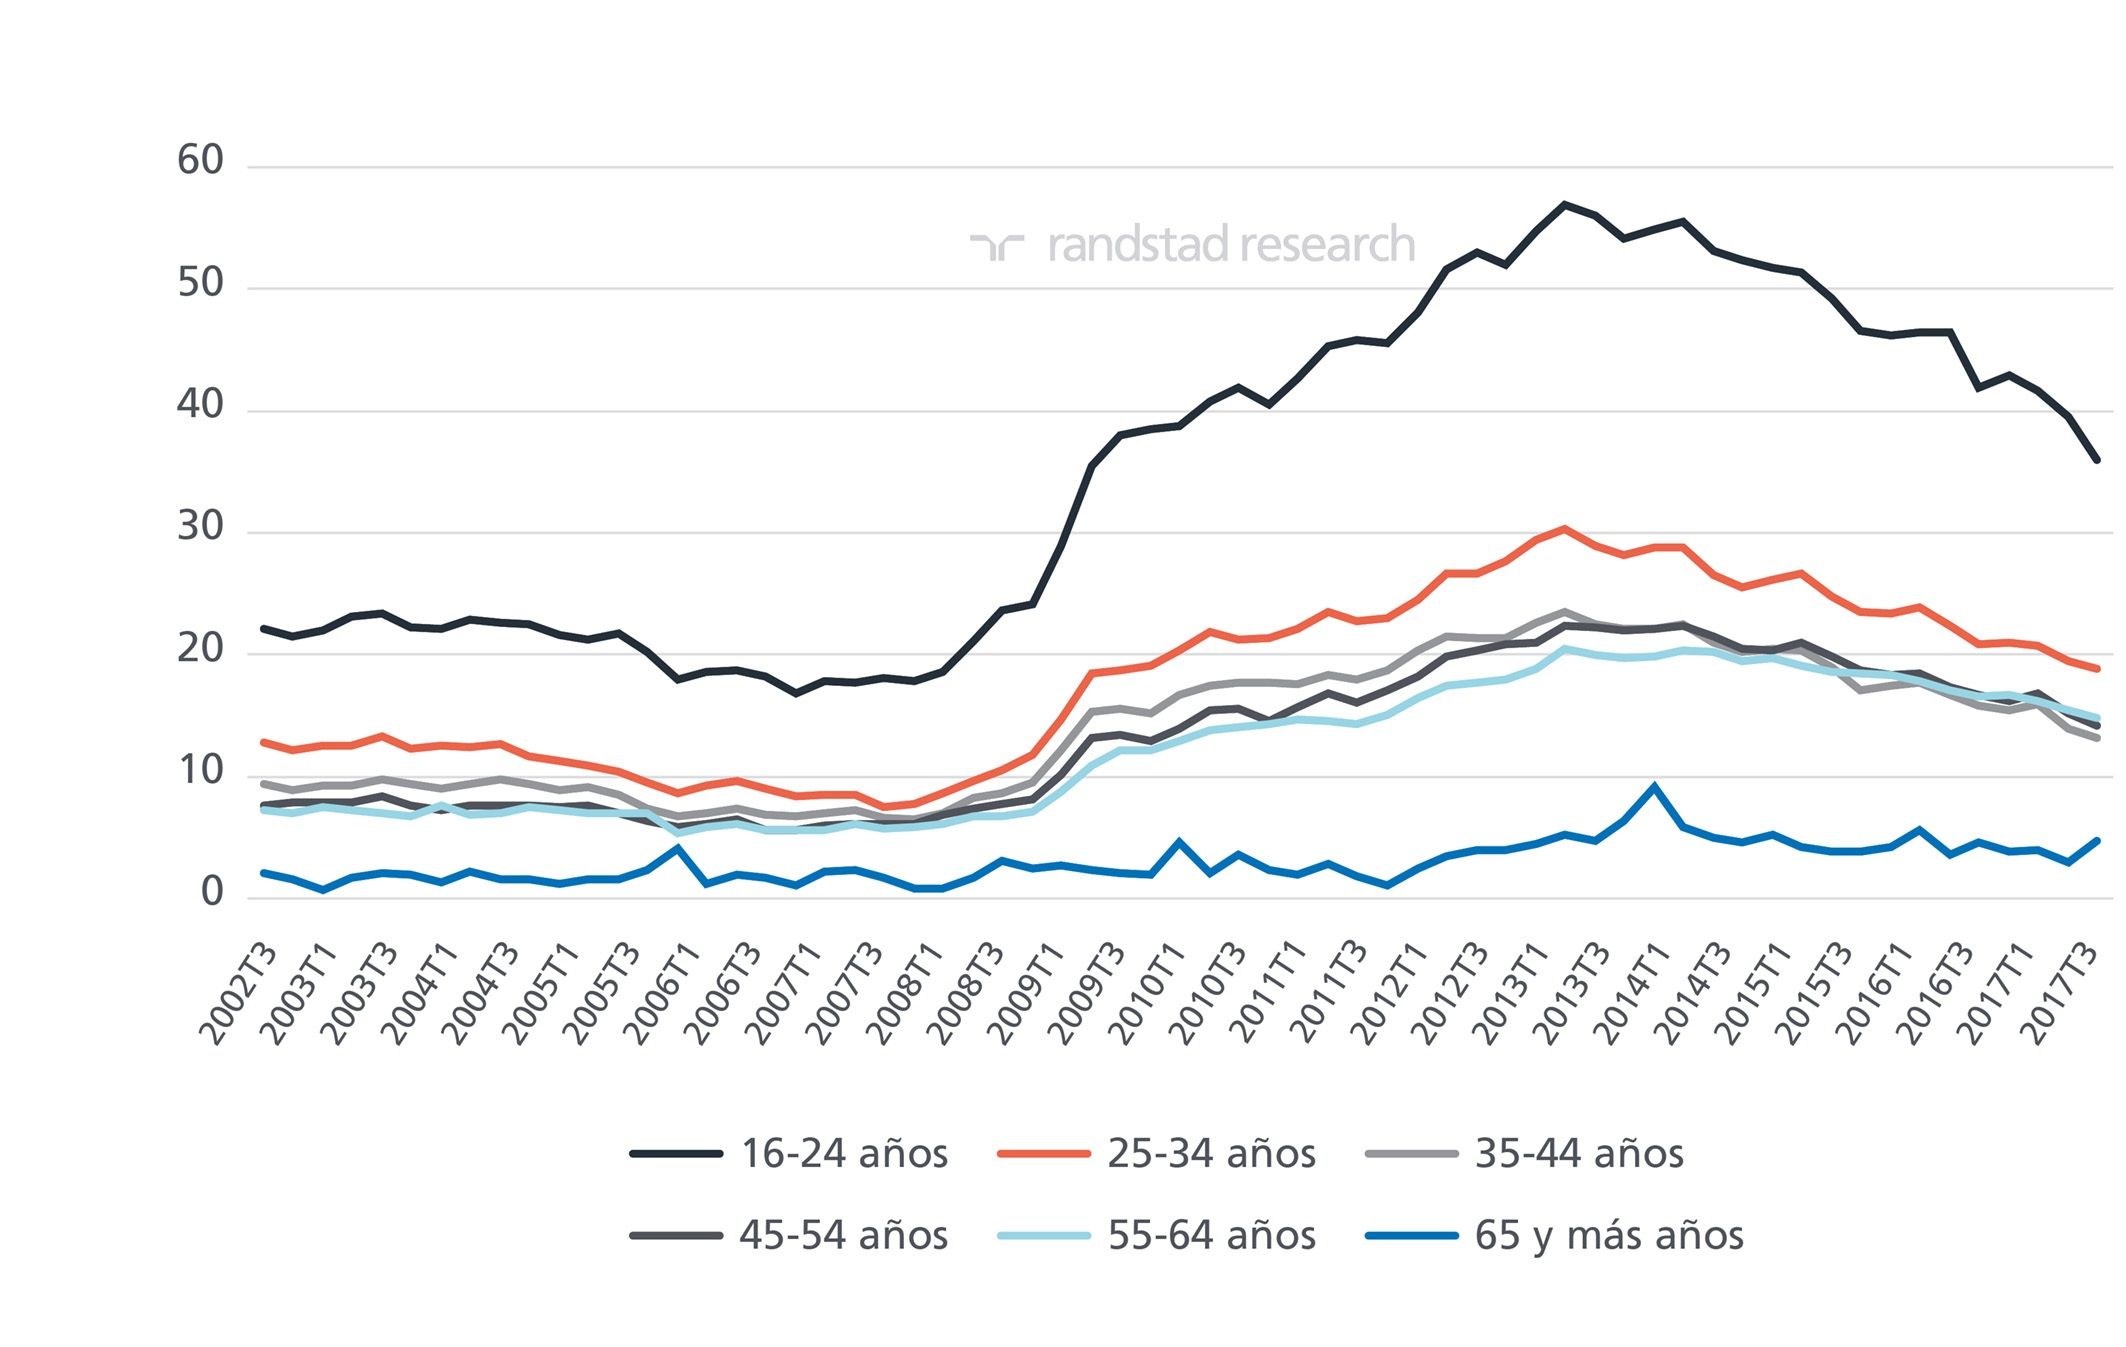 datos epa tercer trimestre 2017